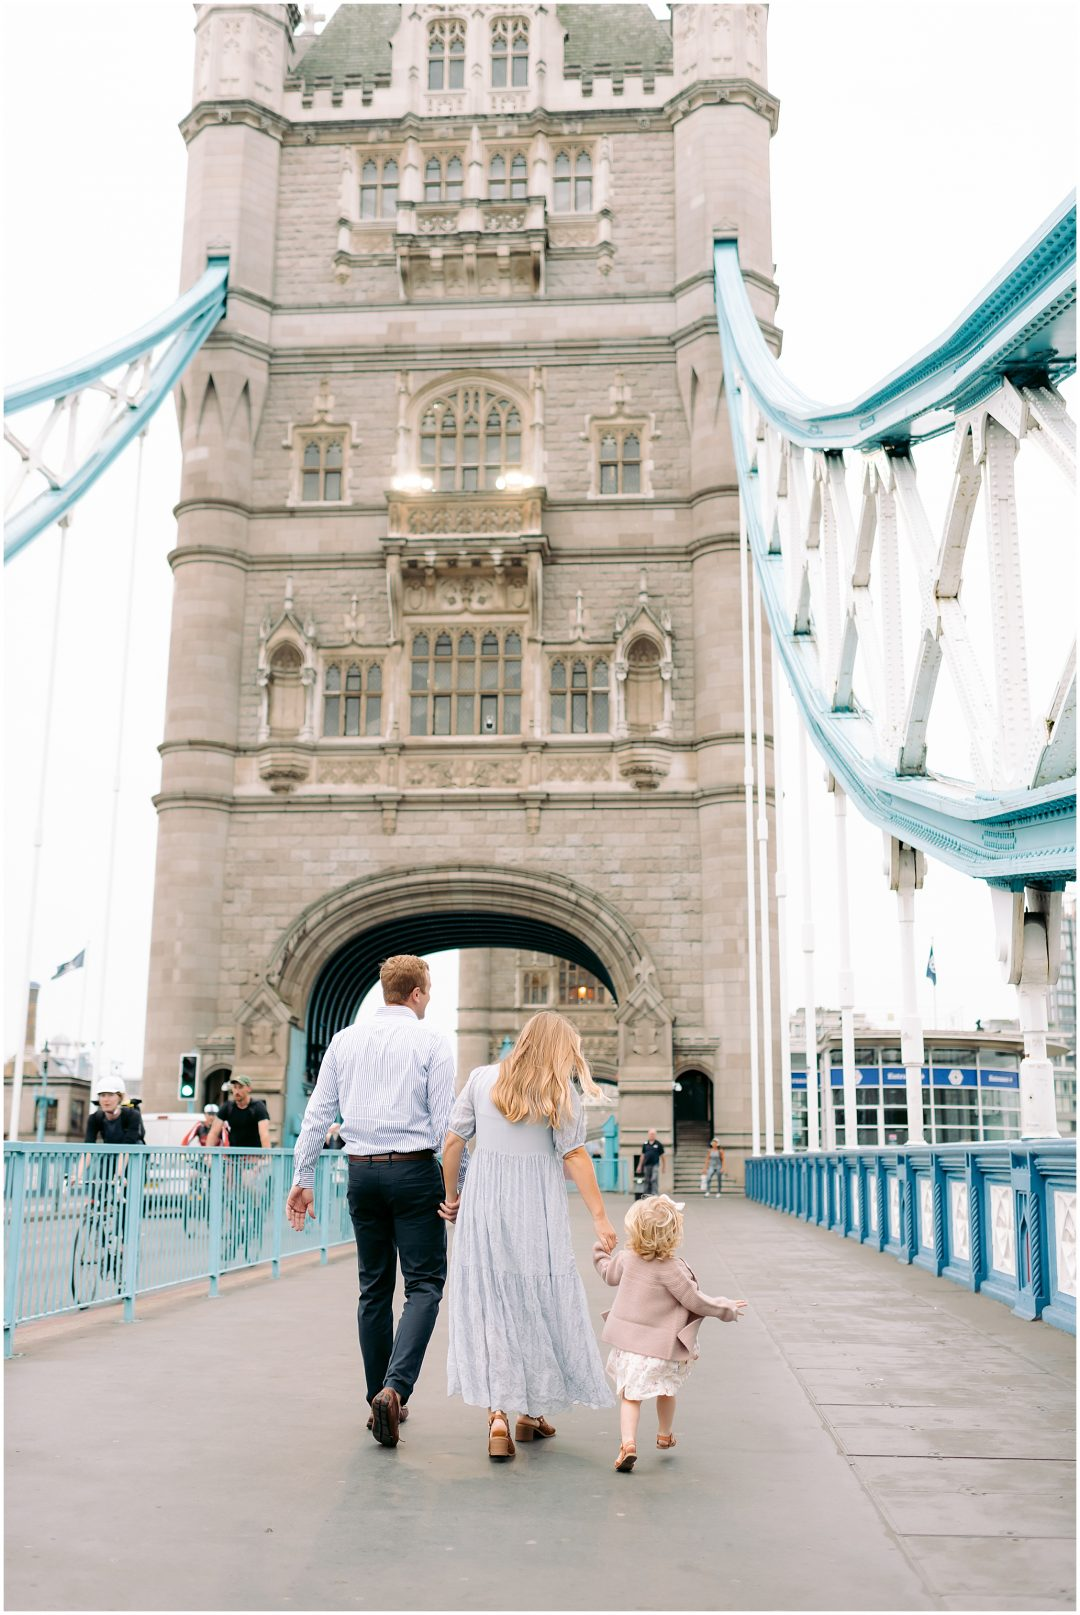 London family photographer, Tower Bridge - family - London family photographer Tower Bridge family shoot Nkimaphotography 0011